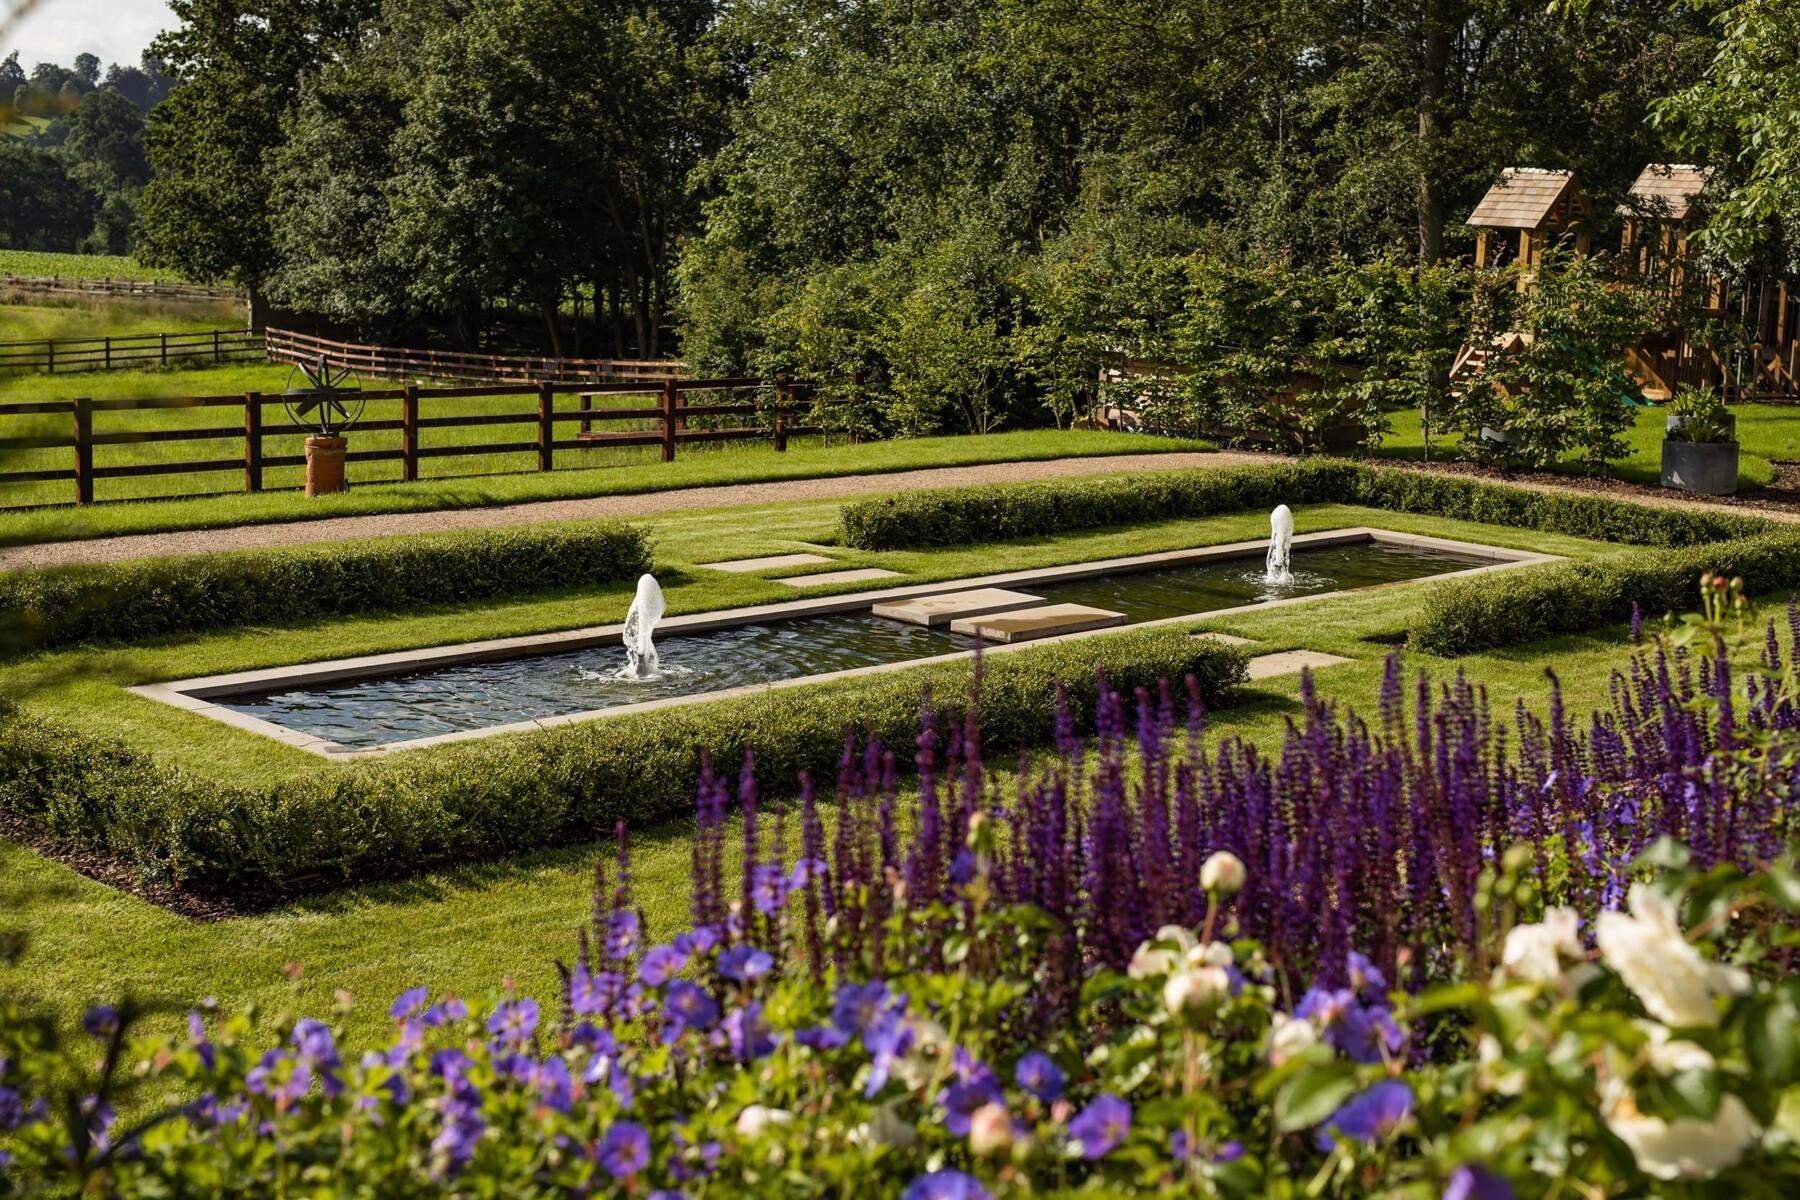 Nicholsons Garden - Lockdown For The Grandchildren 1